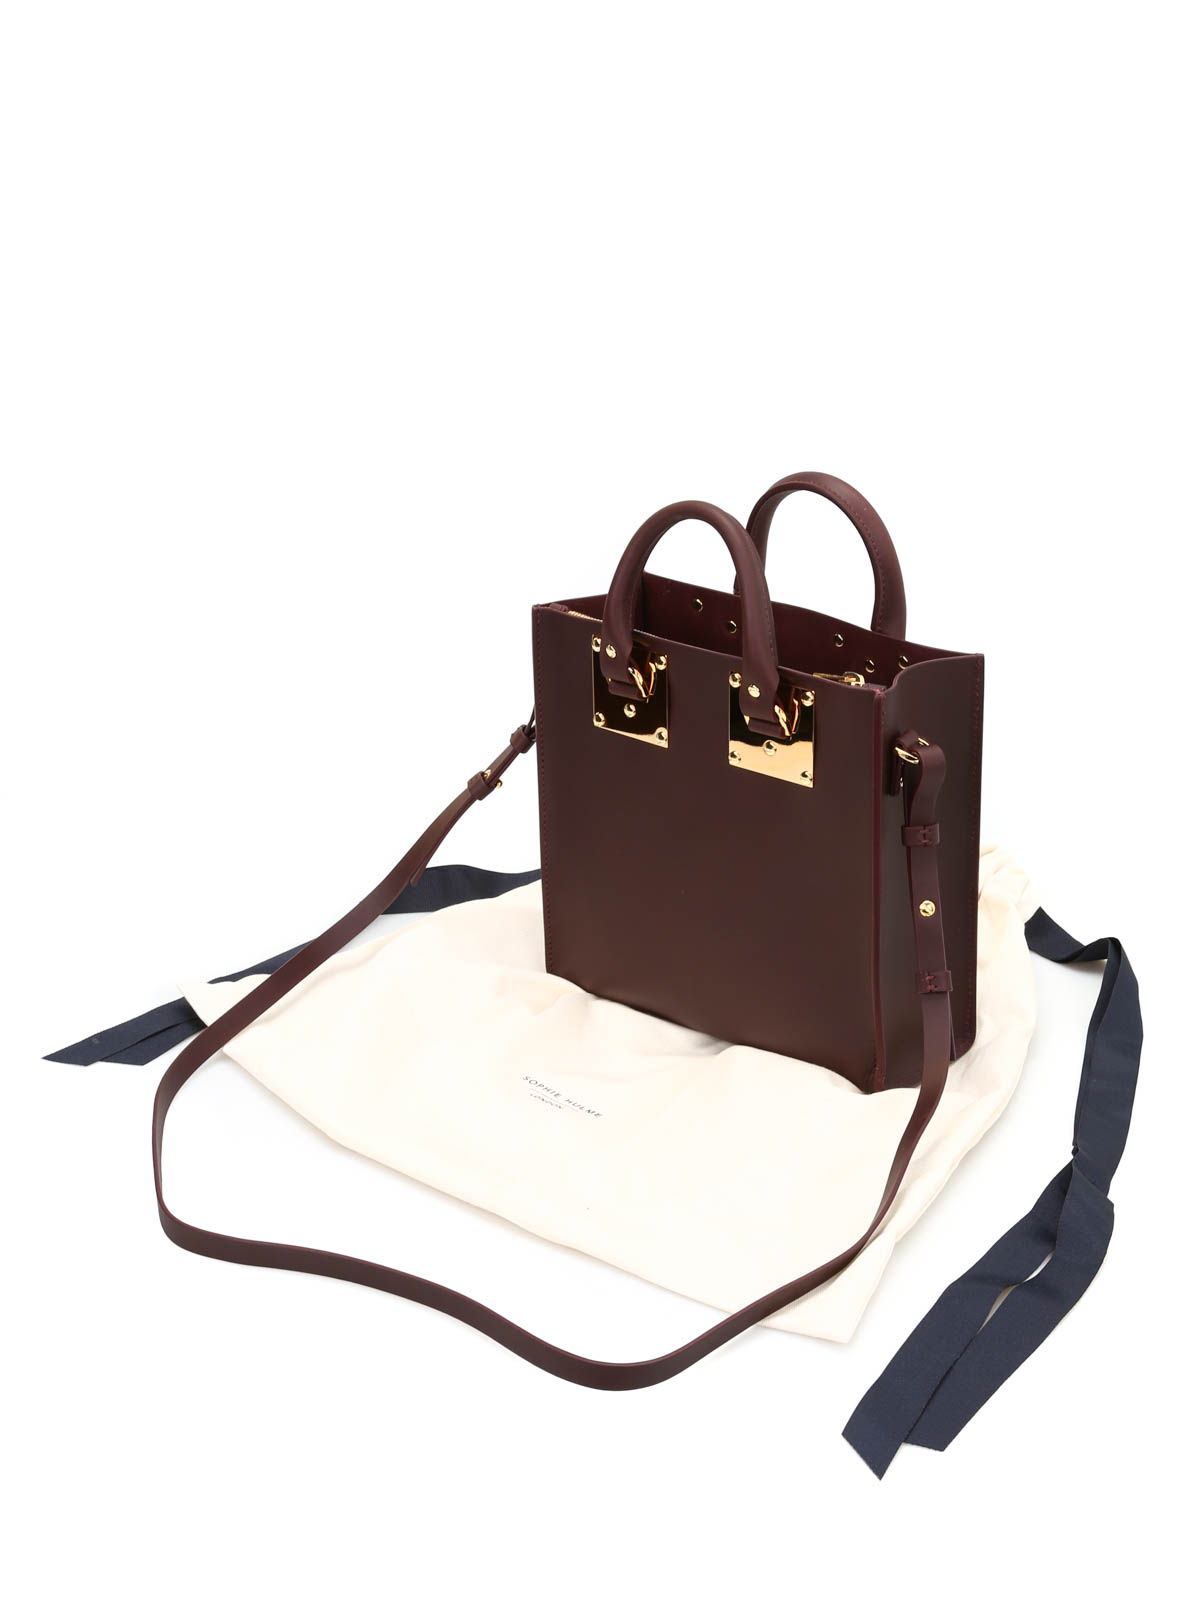 31e49244d Sophie Hulme - Albion square tote - totes bags - BG151LE OXBLOOD